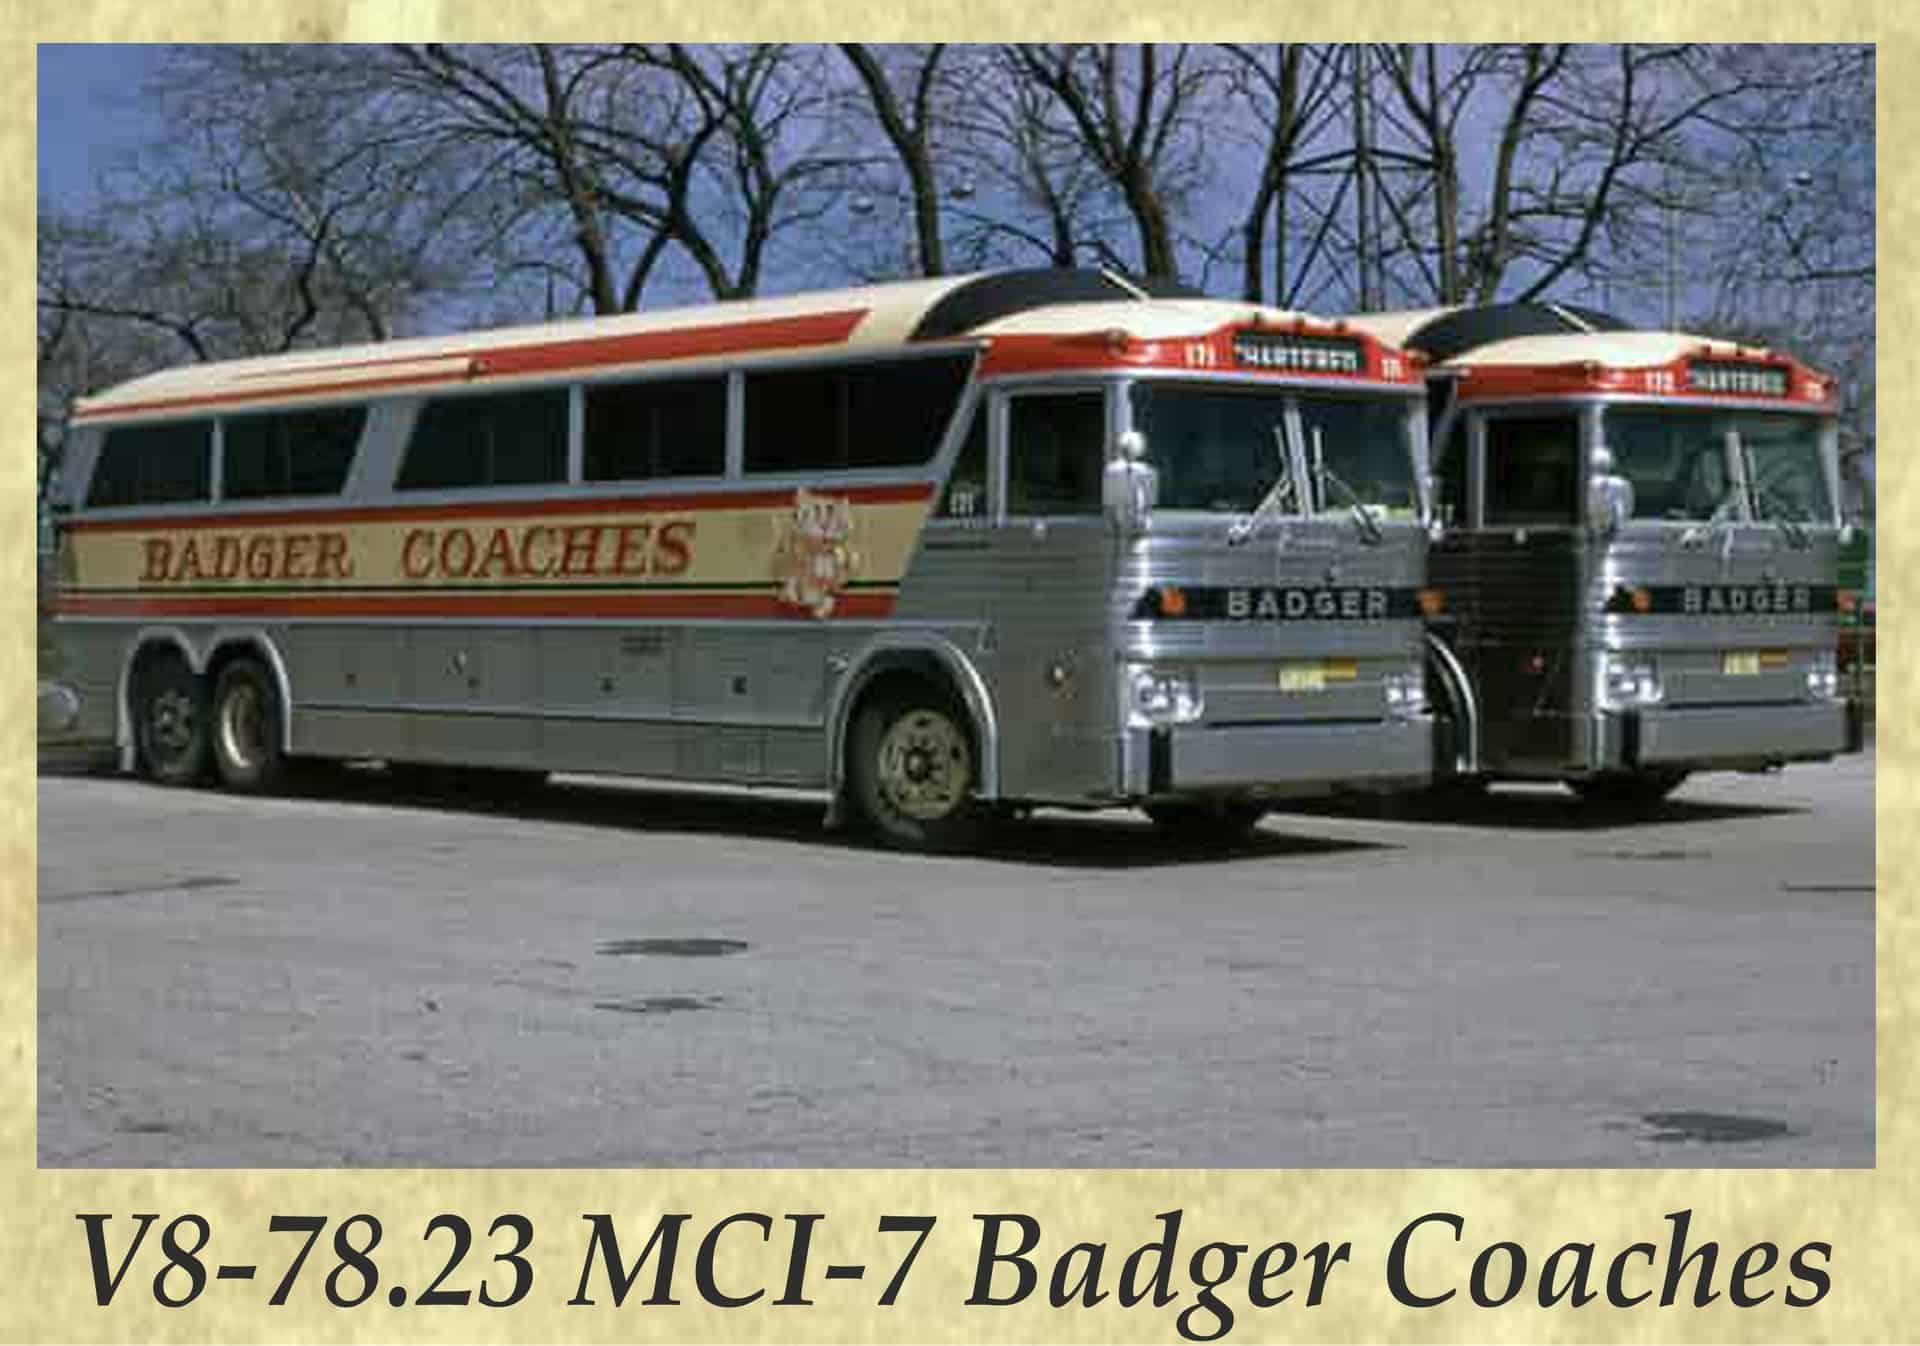 V8-78.23 MCI-7 Badger Coaches